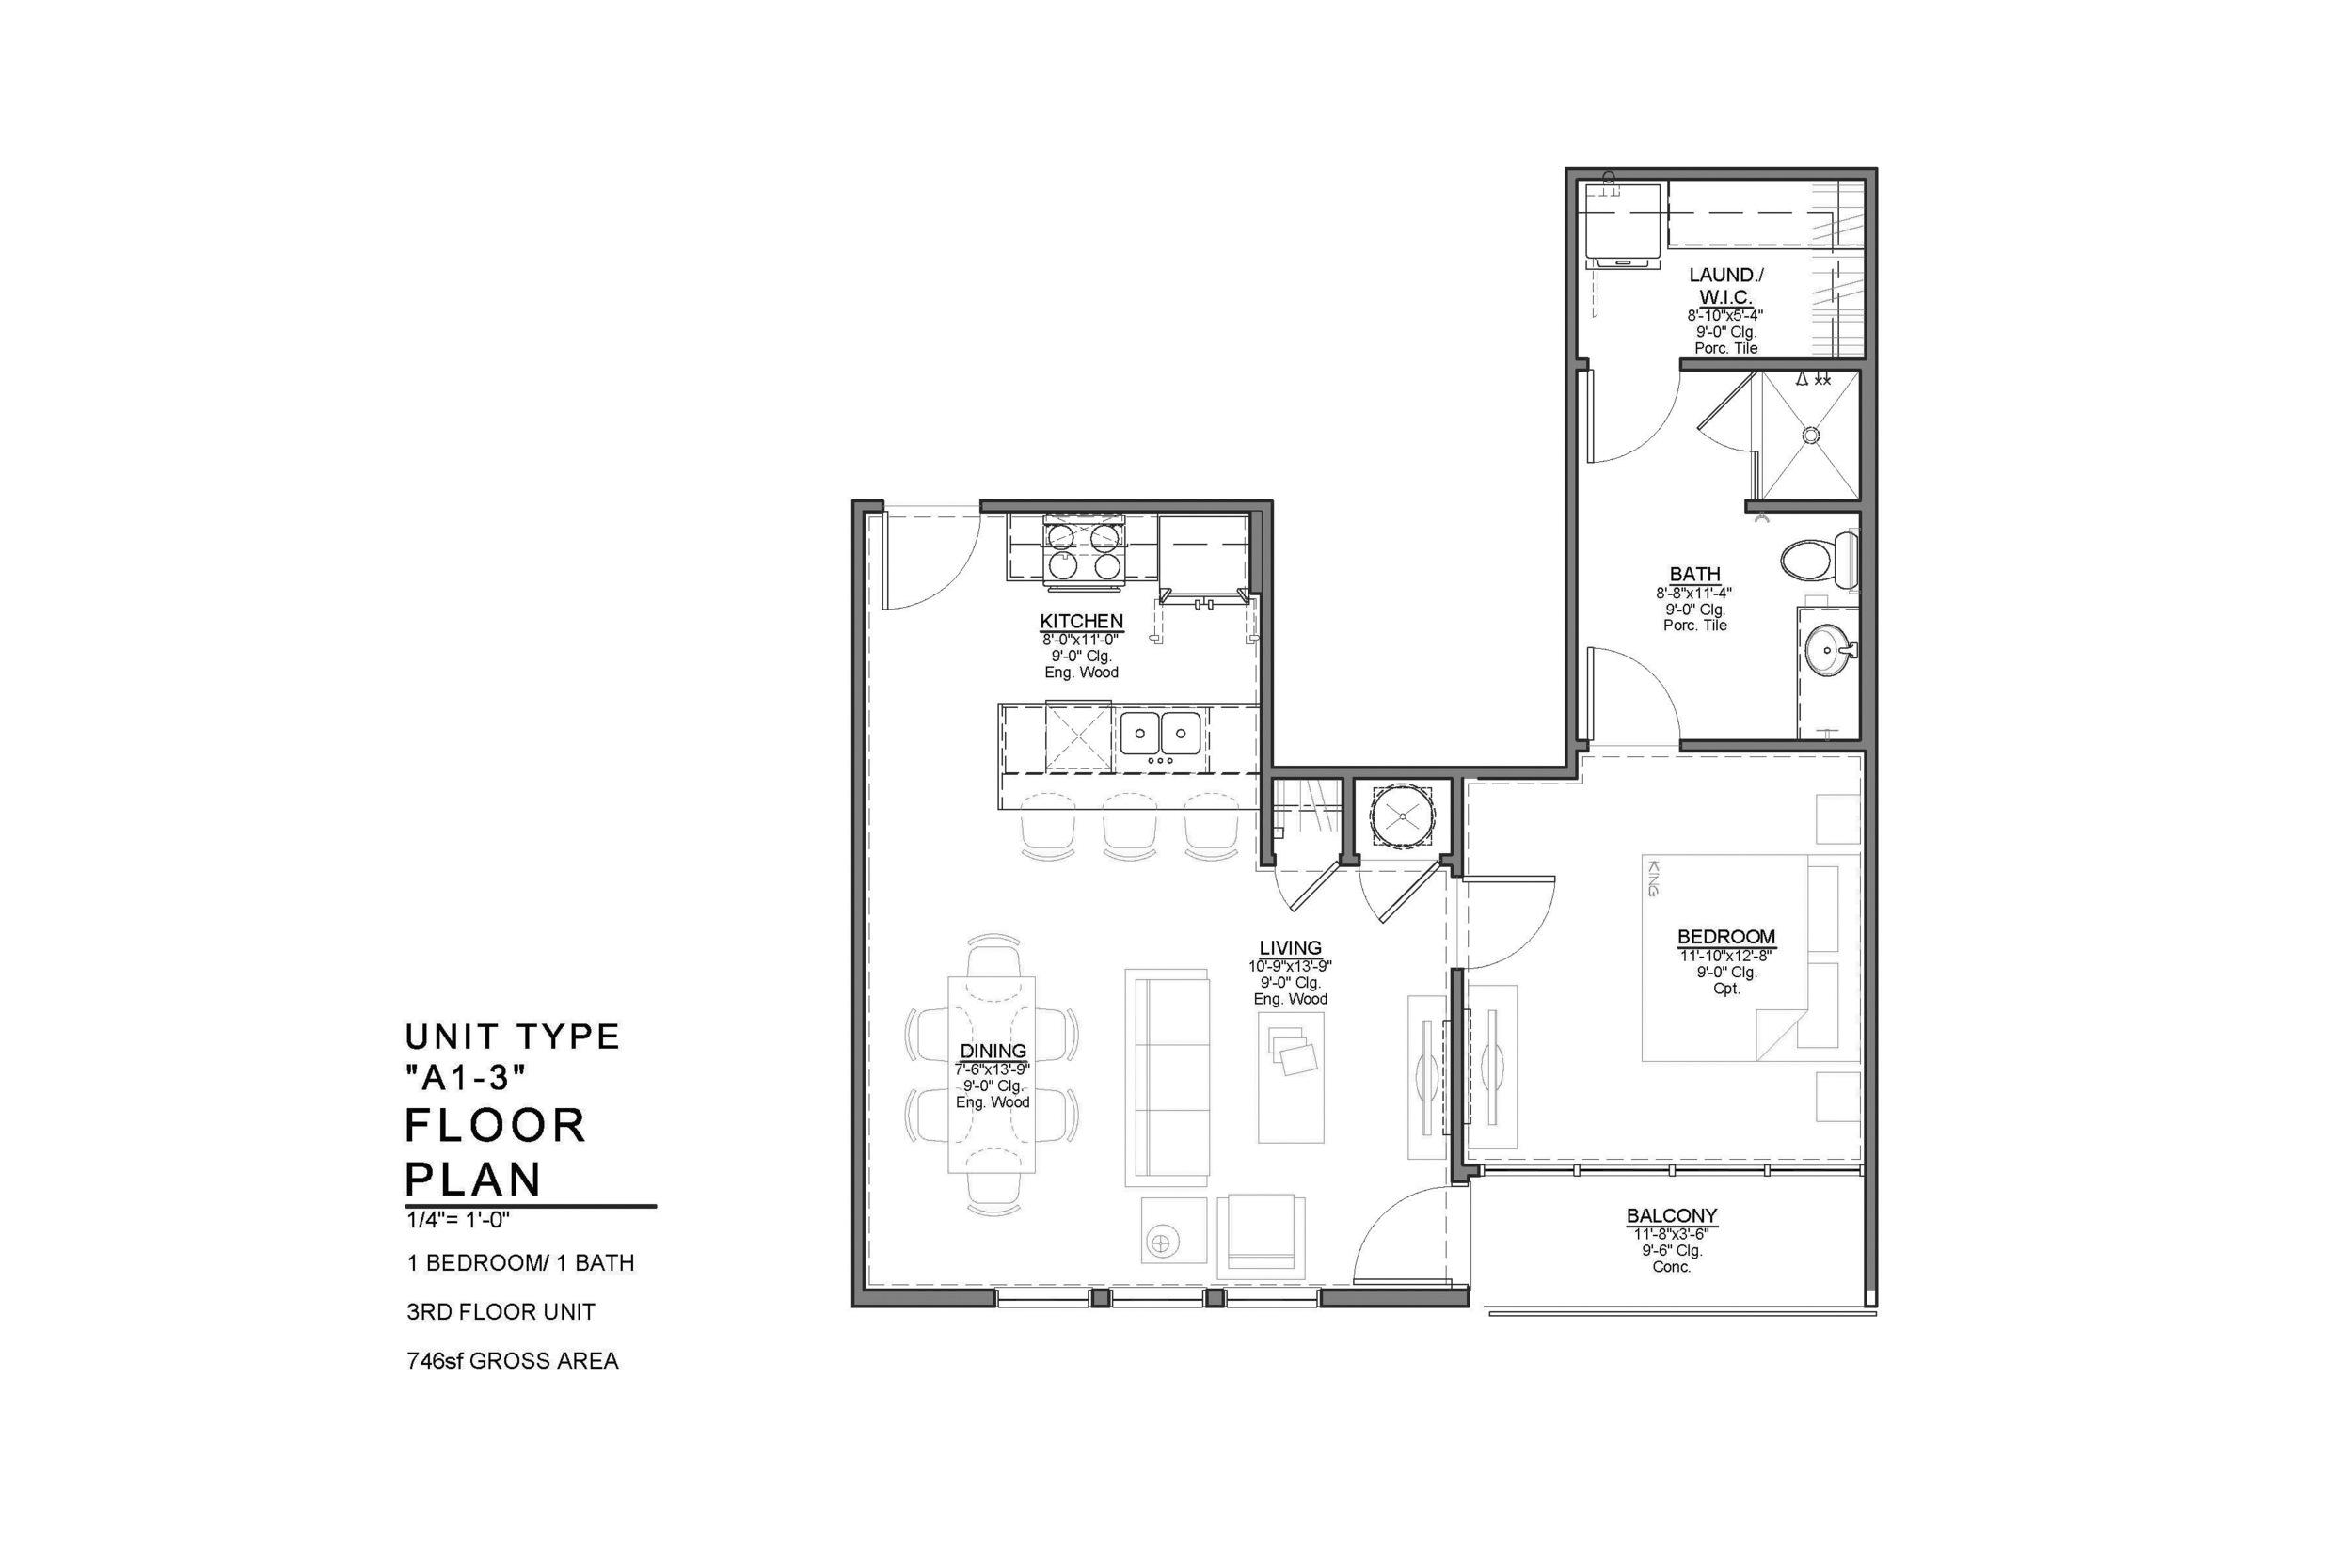 A1-3 FLOOR PLAN: 1 BEDROOM / 1 BATH